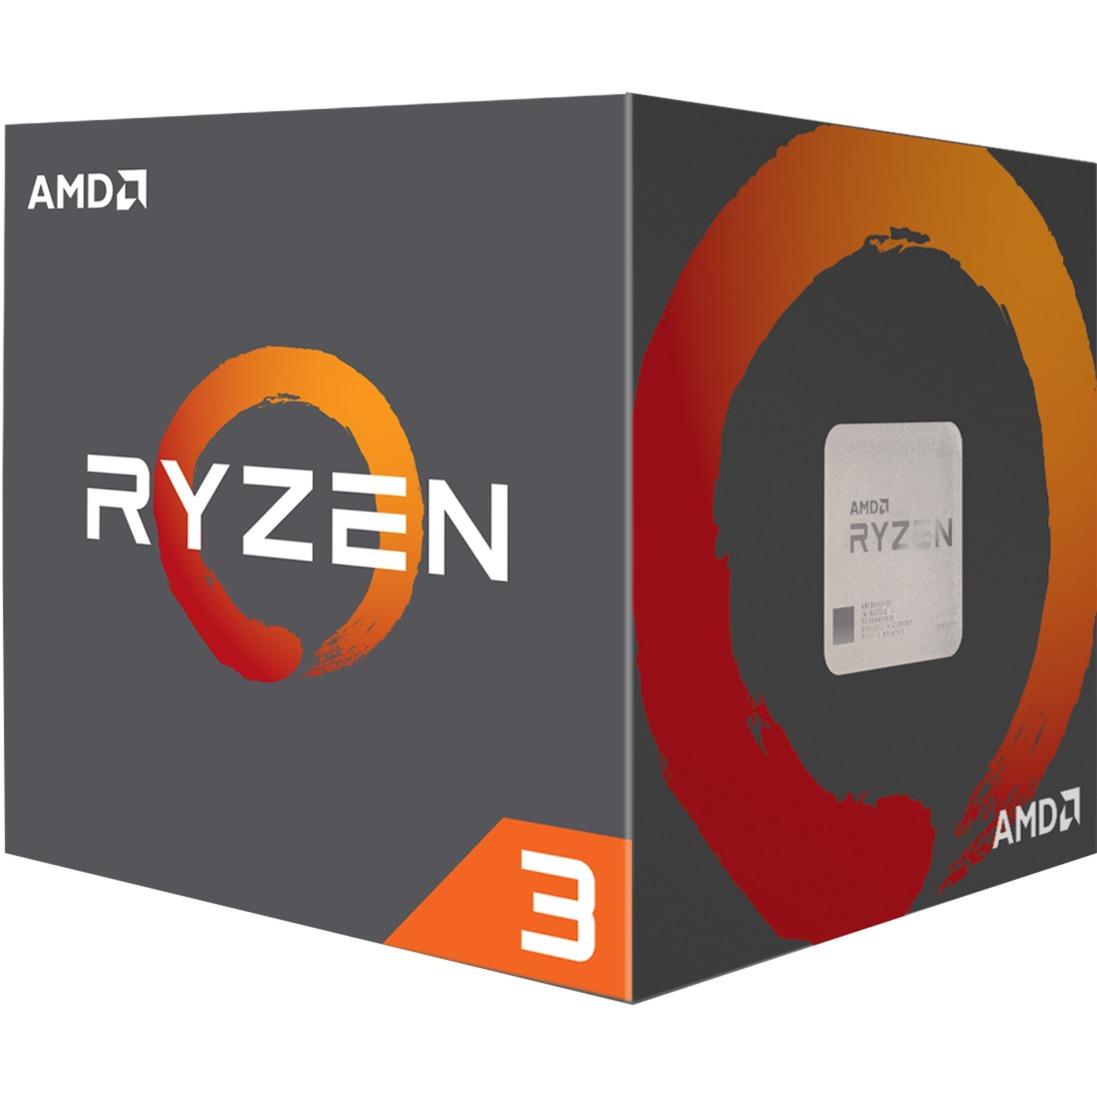 Ryzen 3 1200 WRAITH, Prozessor